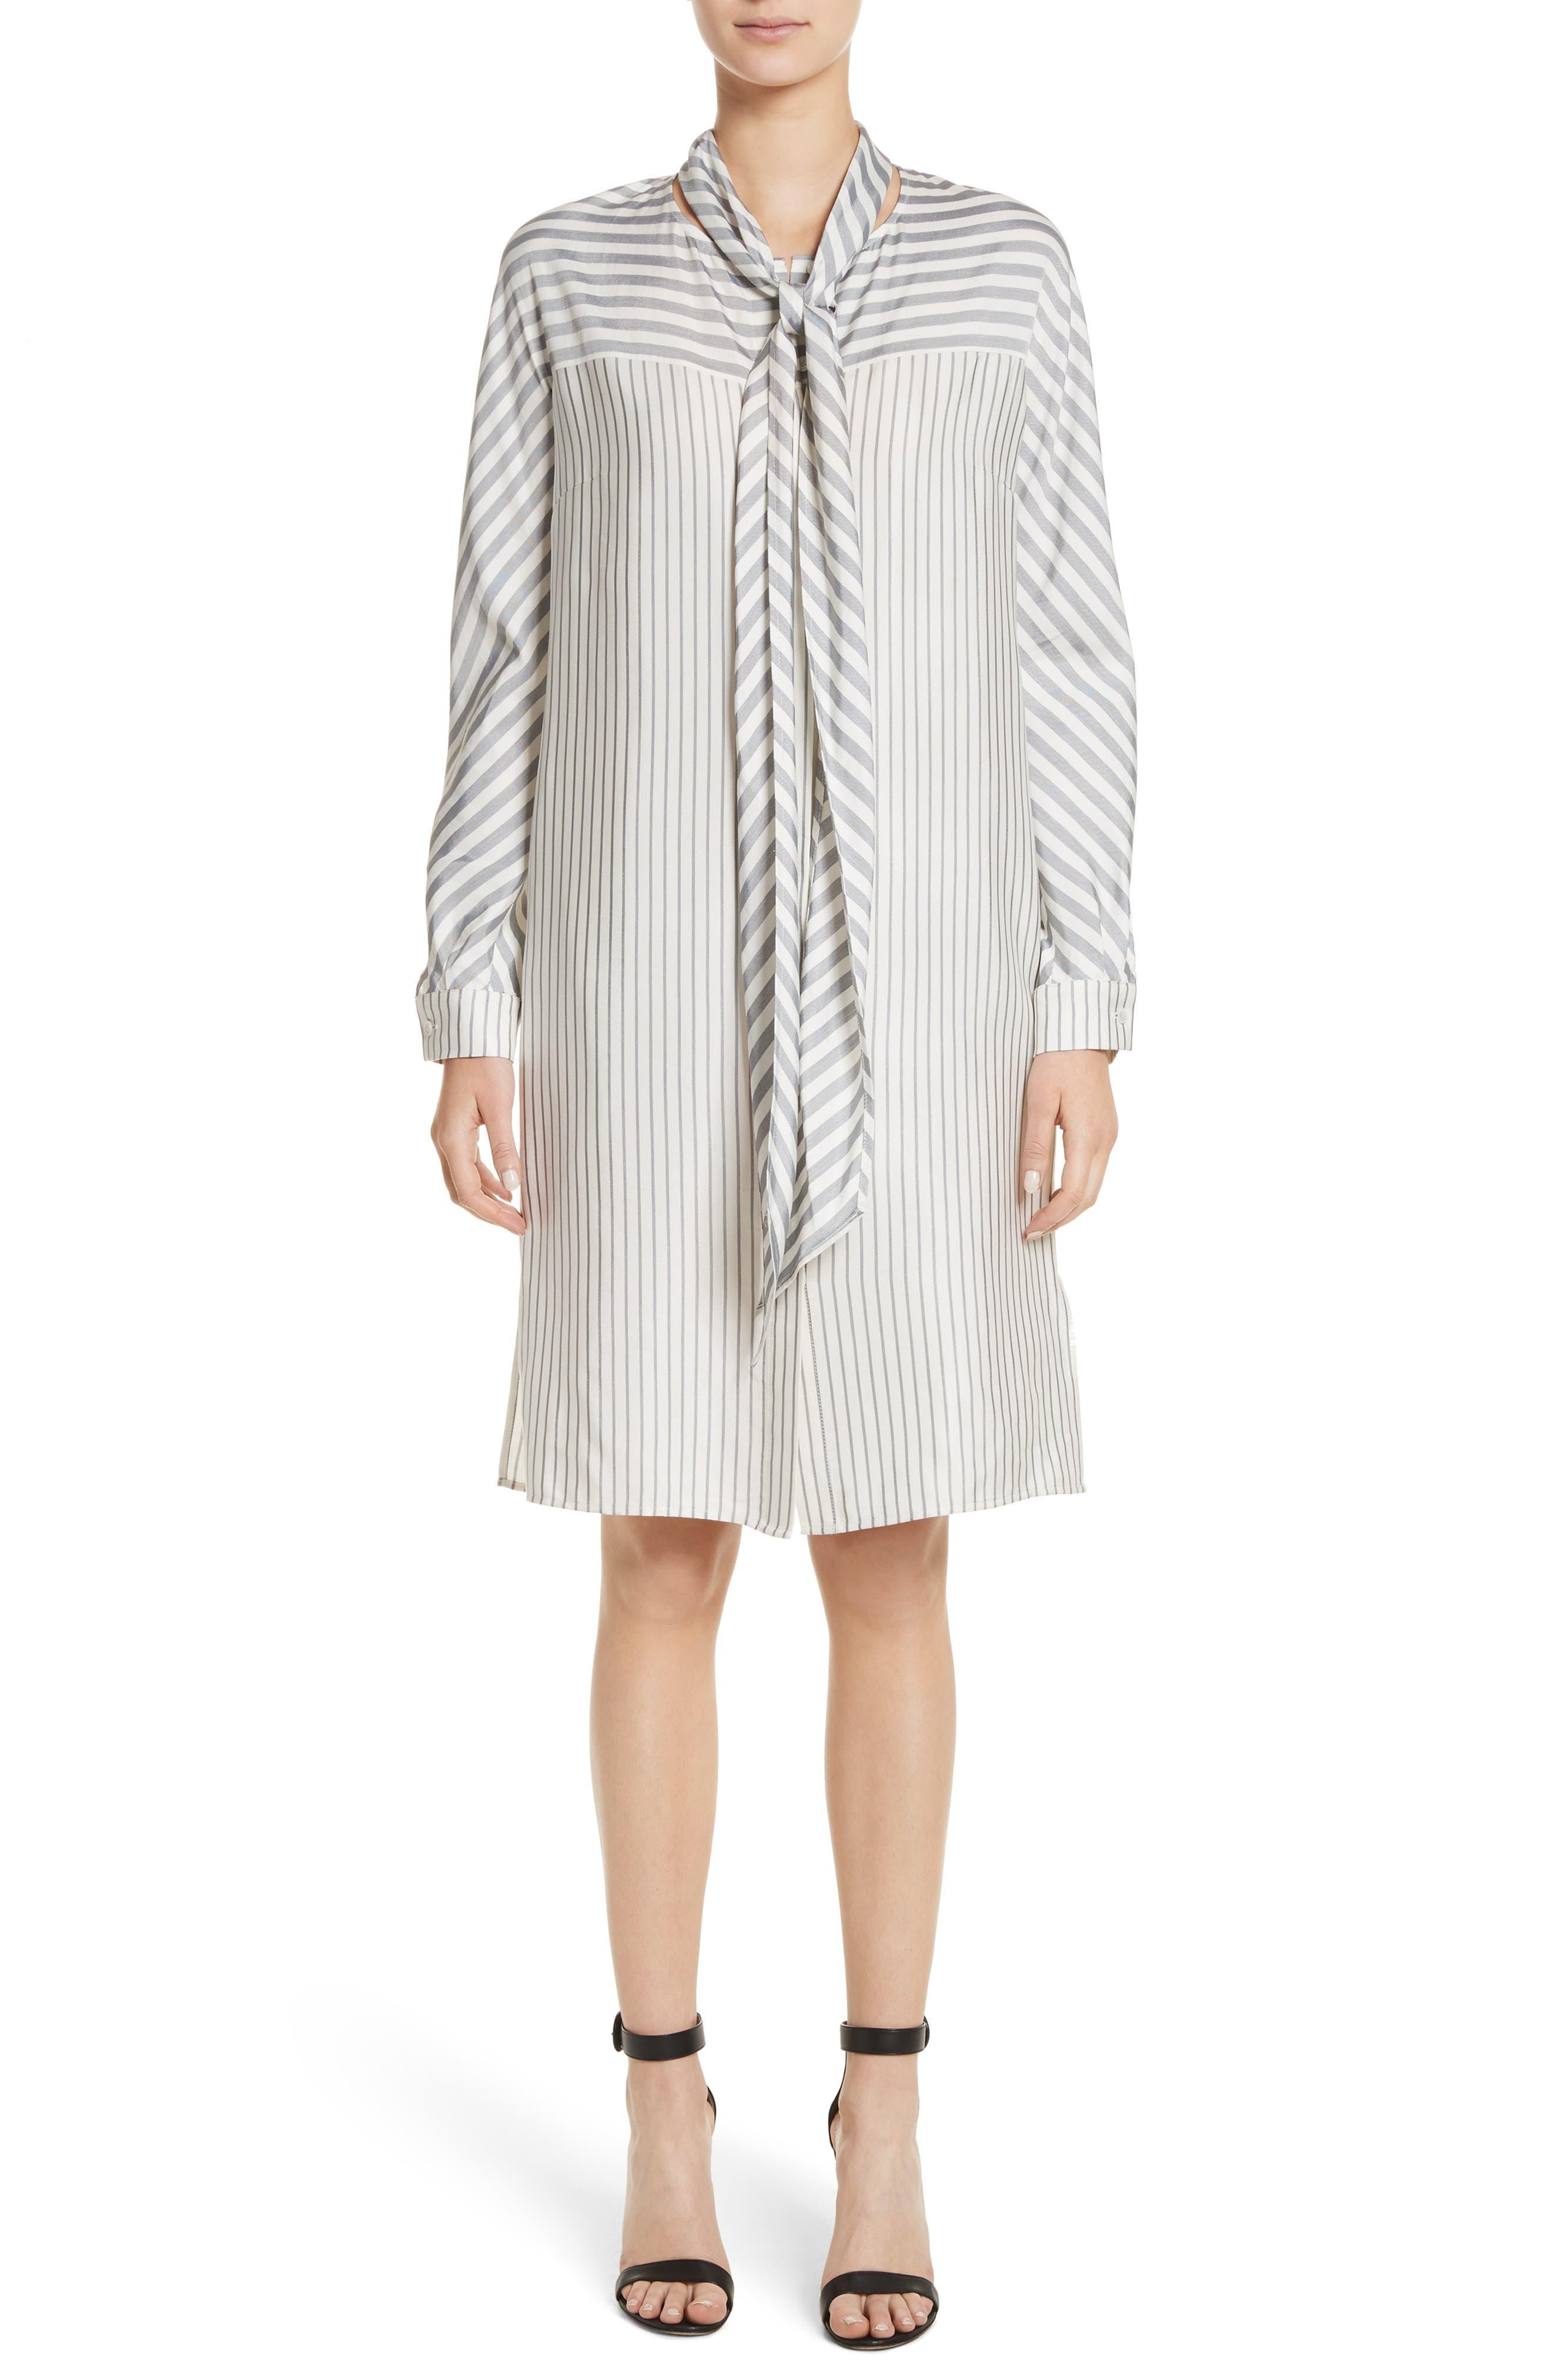 ST. JOHN COLLECTION Stripe Tie Neck Shirtdress, Main, color, 900